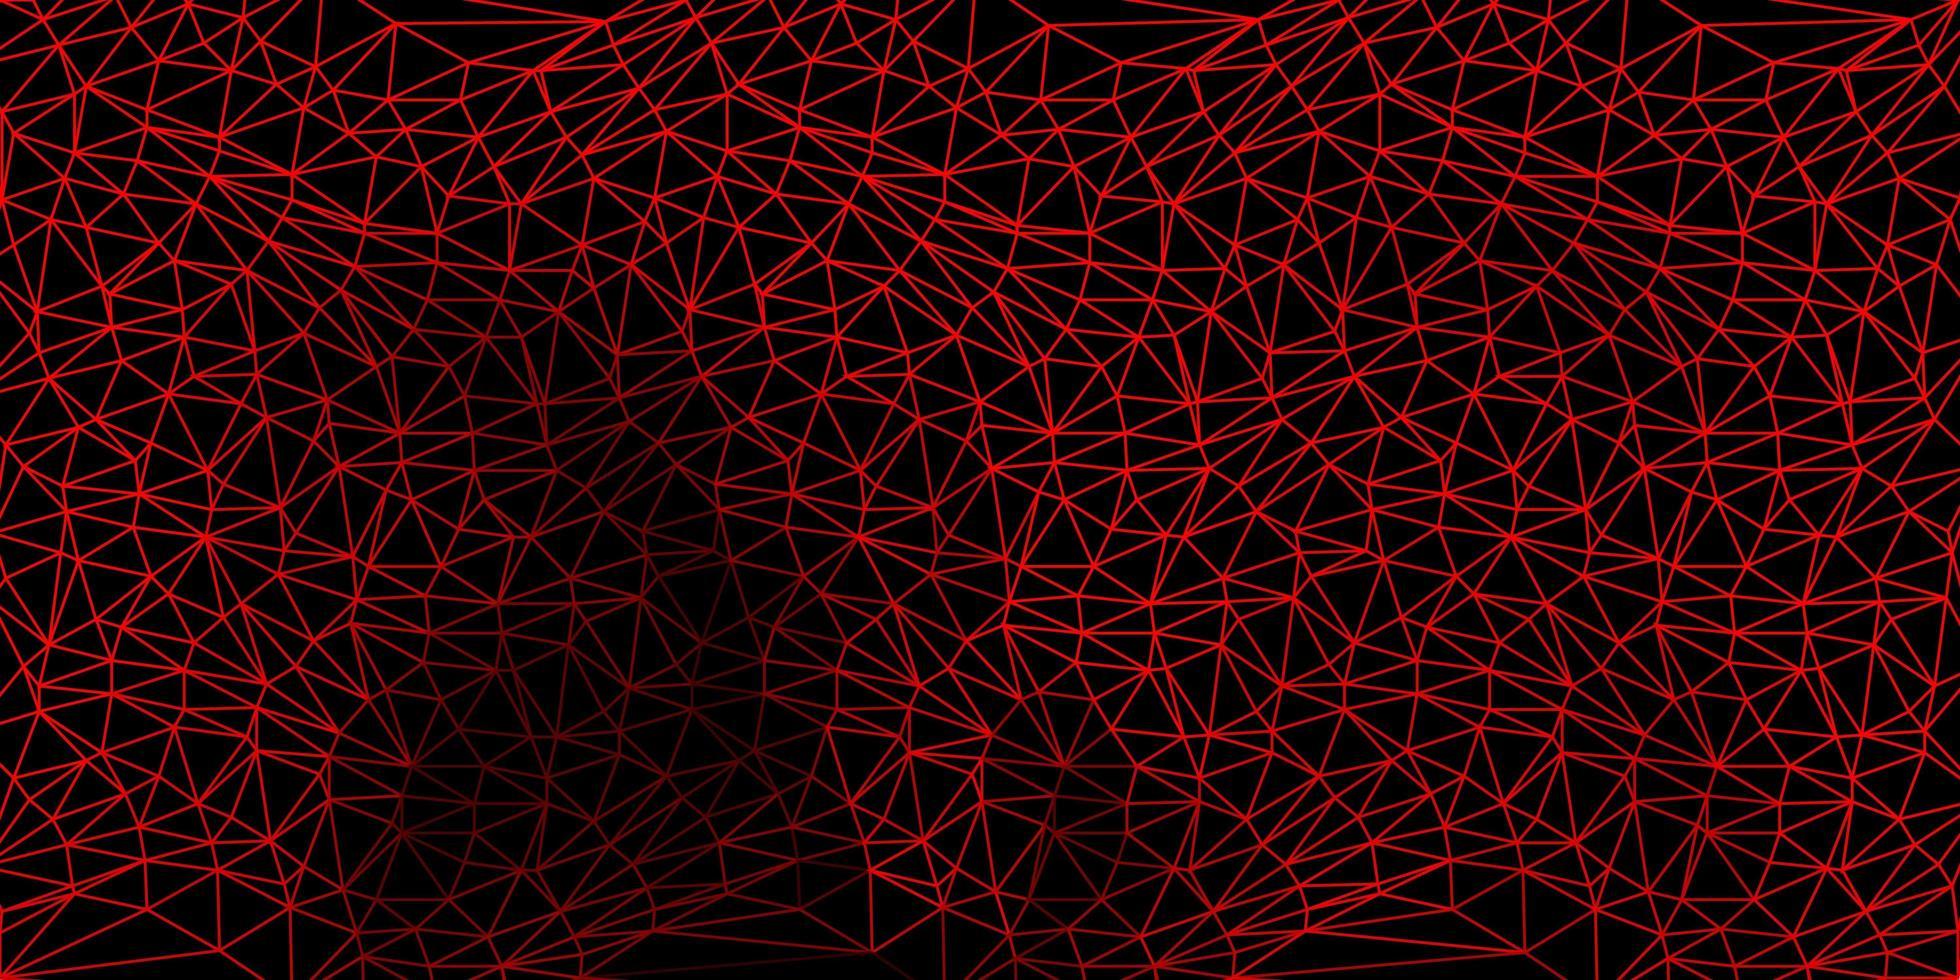 dunkelrotes Farbverlaufspolygon-Design. vektor